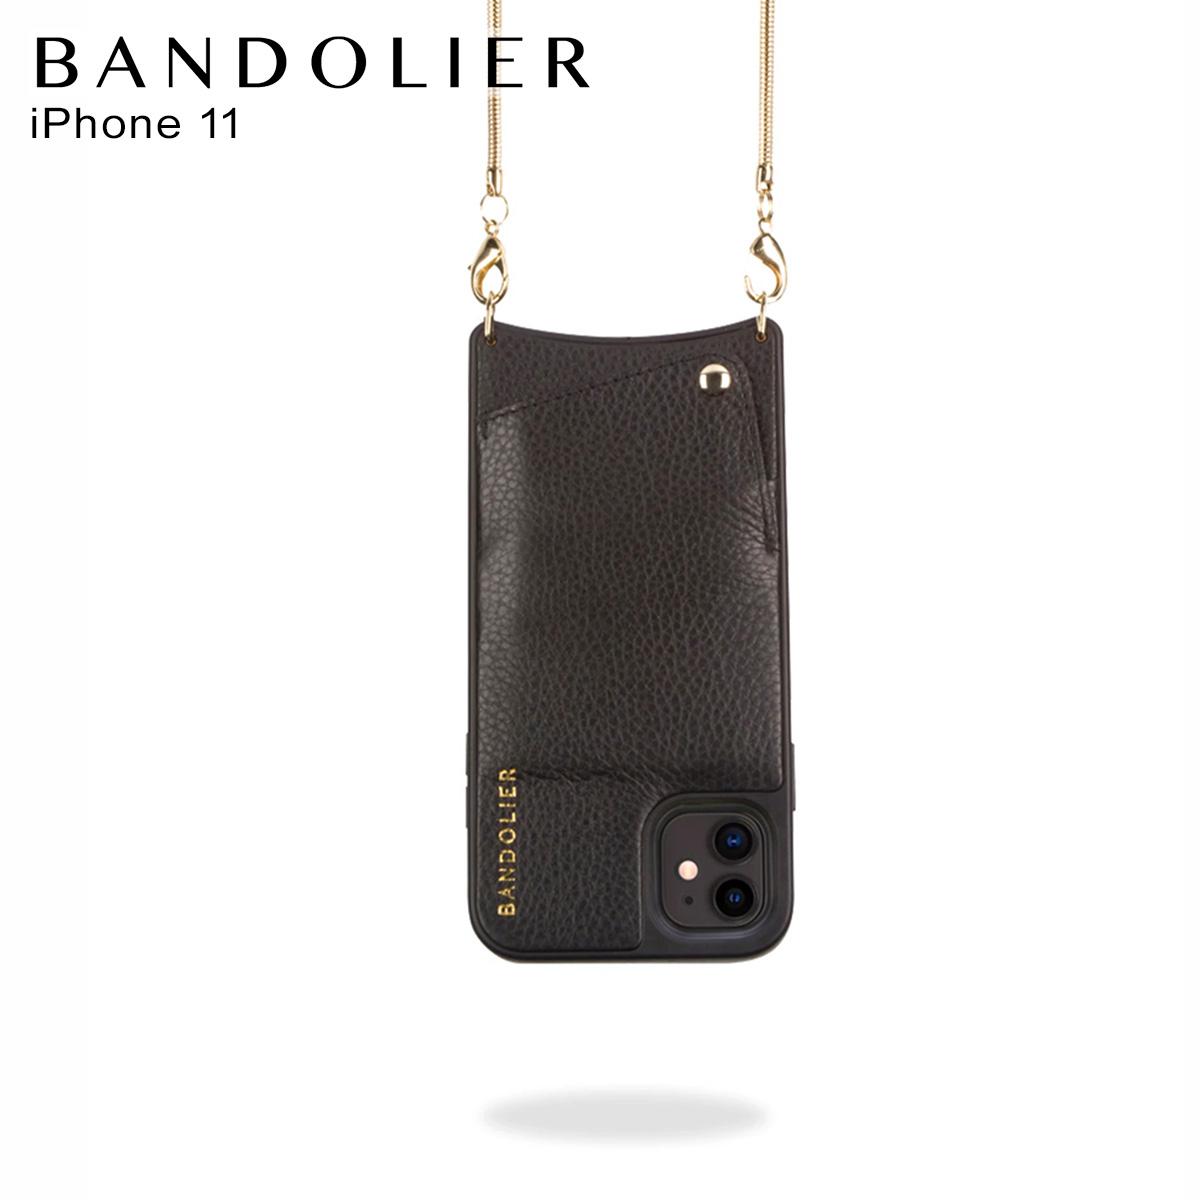 BANDOLIER BELINDA GOLD バンドリヤー ベリンダ ゴールド iPhone11 ケース スマホ 携帯 ショルダー アイフォン メンズ レディース ブラック 黒 2002 [12月上旬 新入荷]